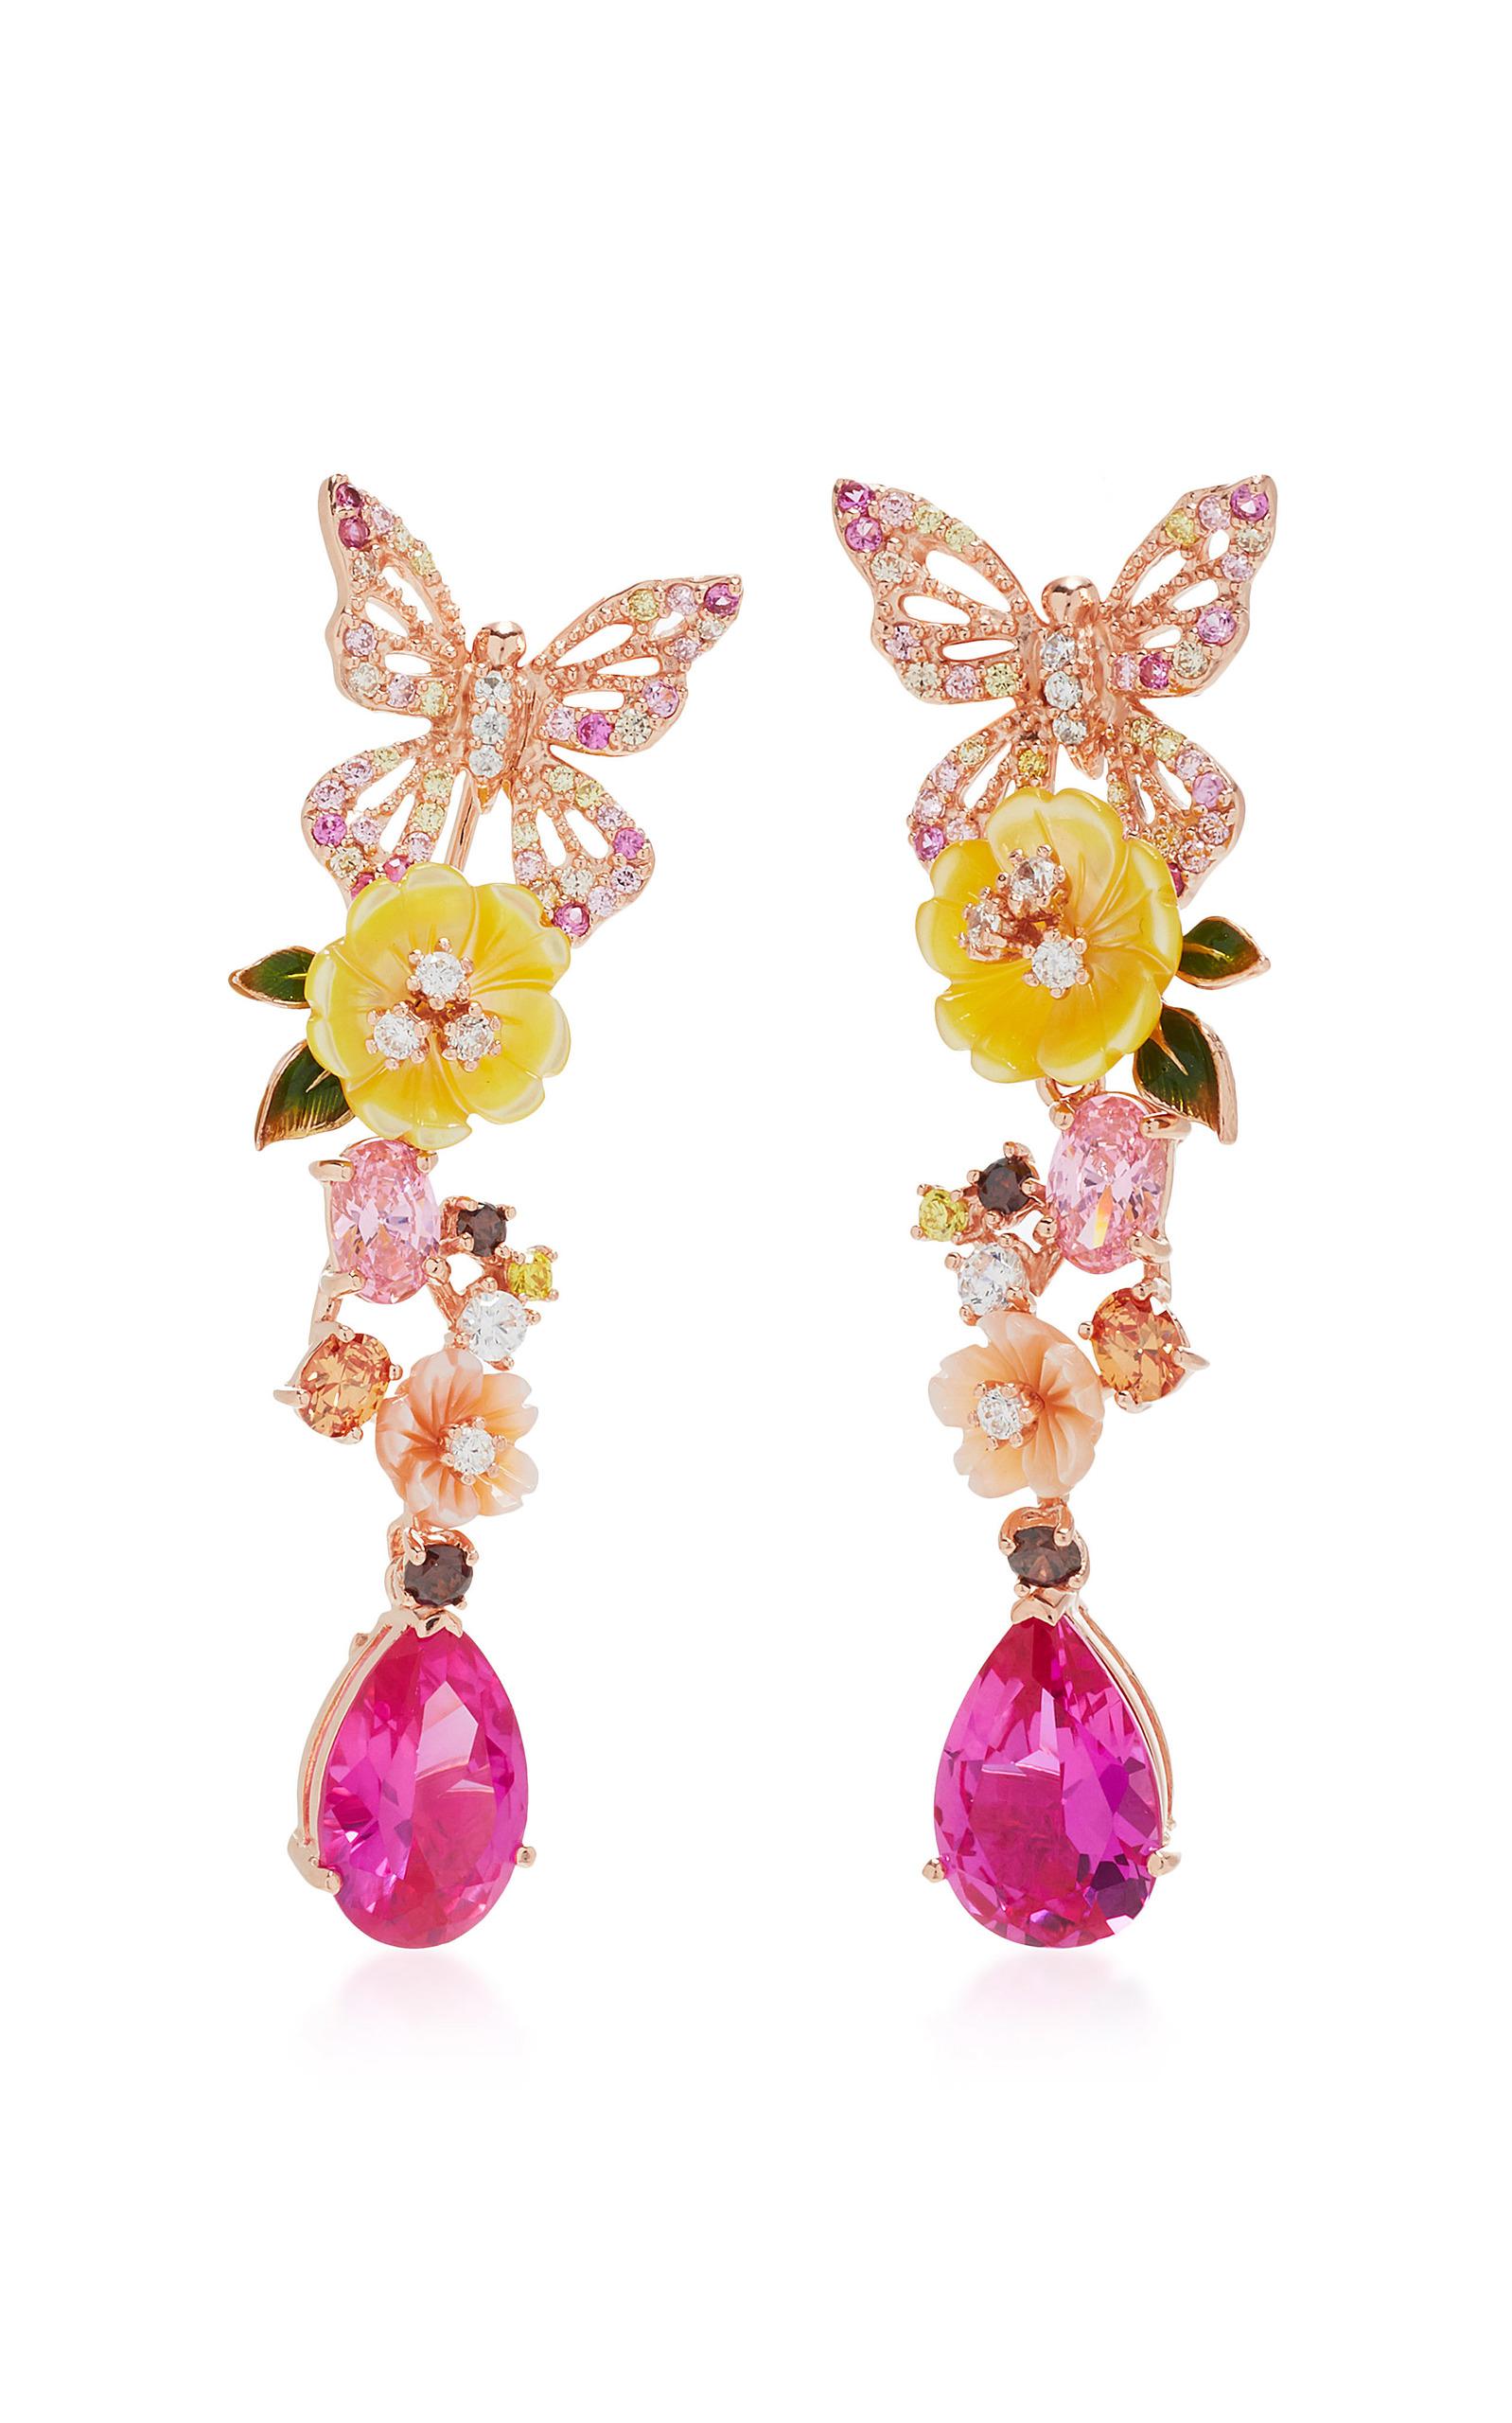 Women's Exclusive: Rose Vine Earrings